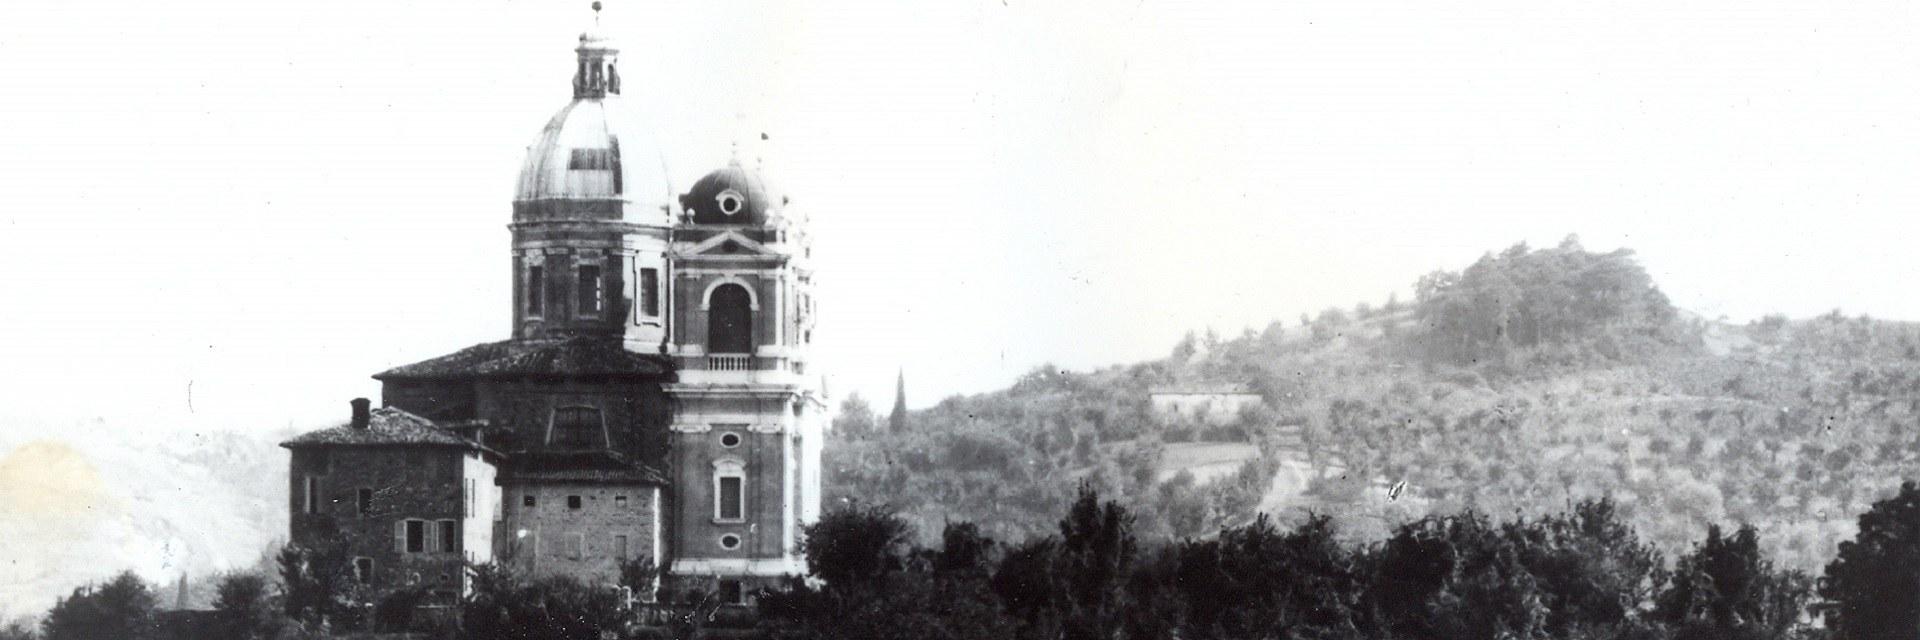 Storia del Santuario